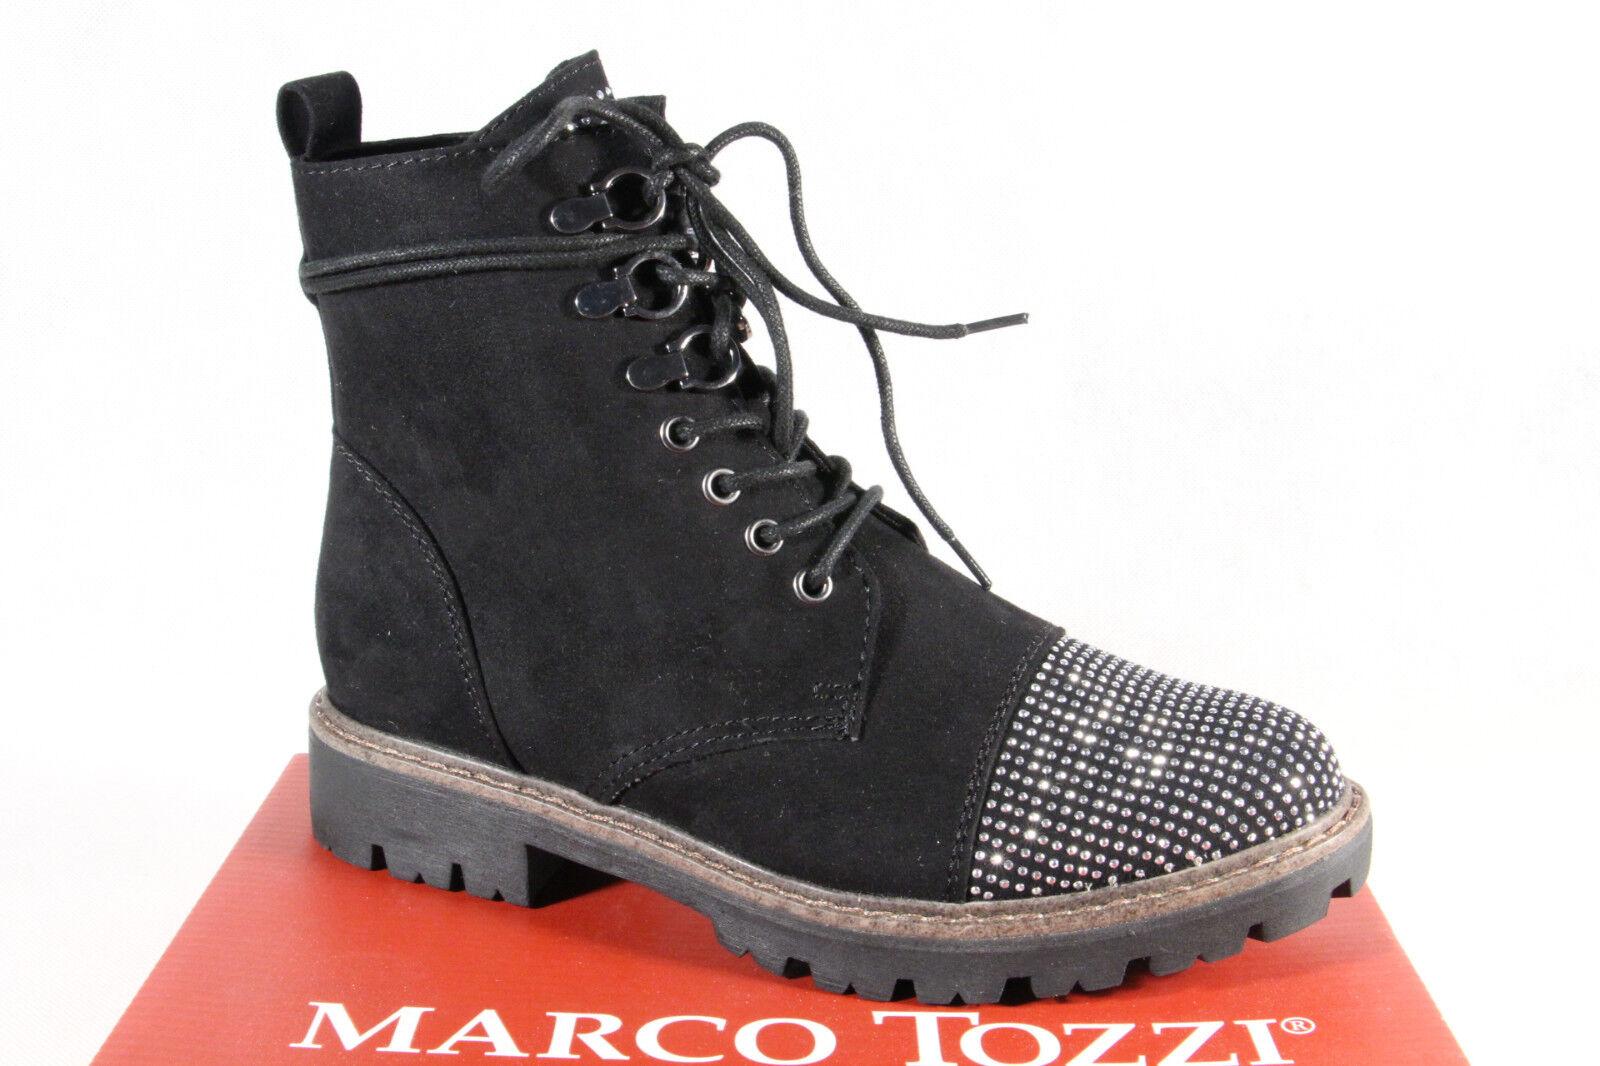 Marco Tozzi Stiefelette Stiefel Winterstiefel Schnürstiefel schwarz 46203 NEU